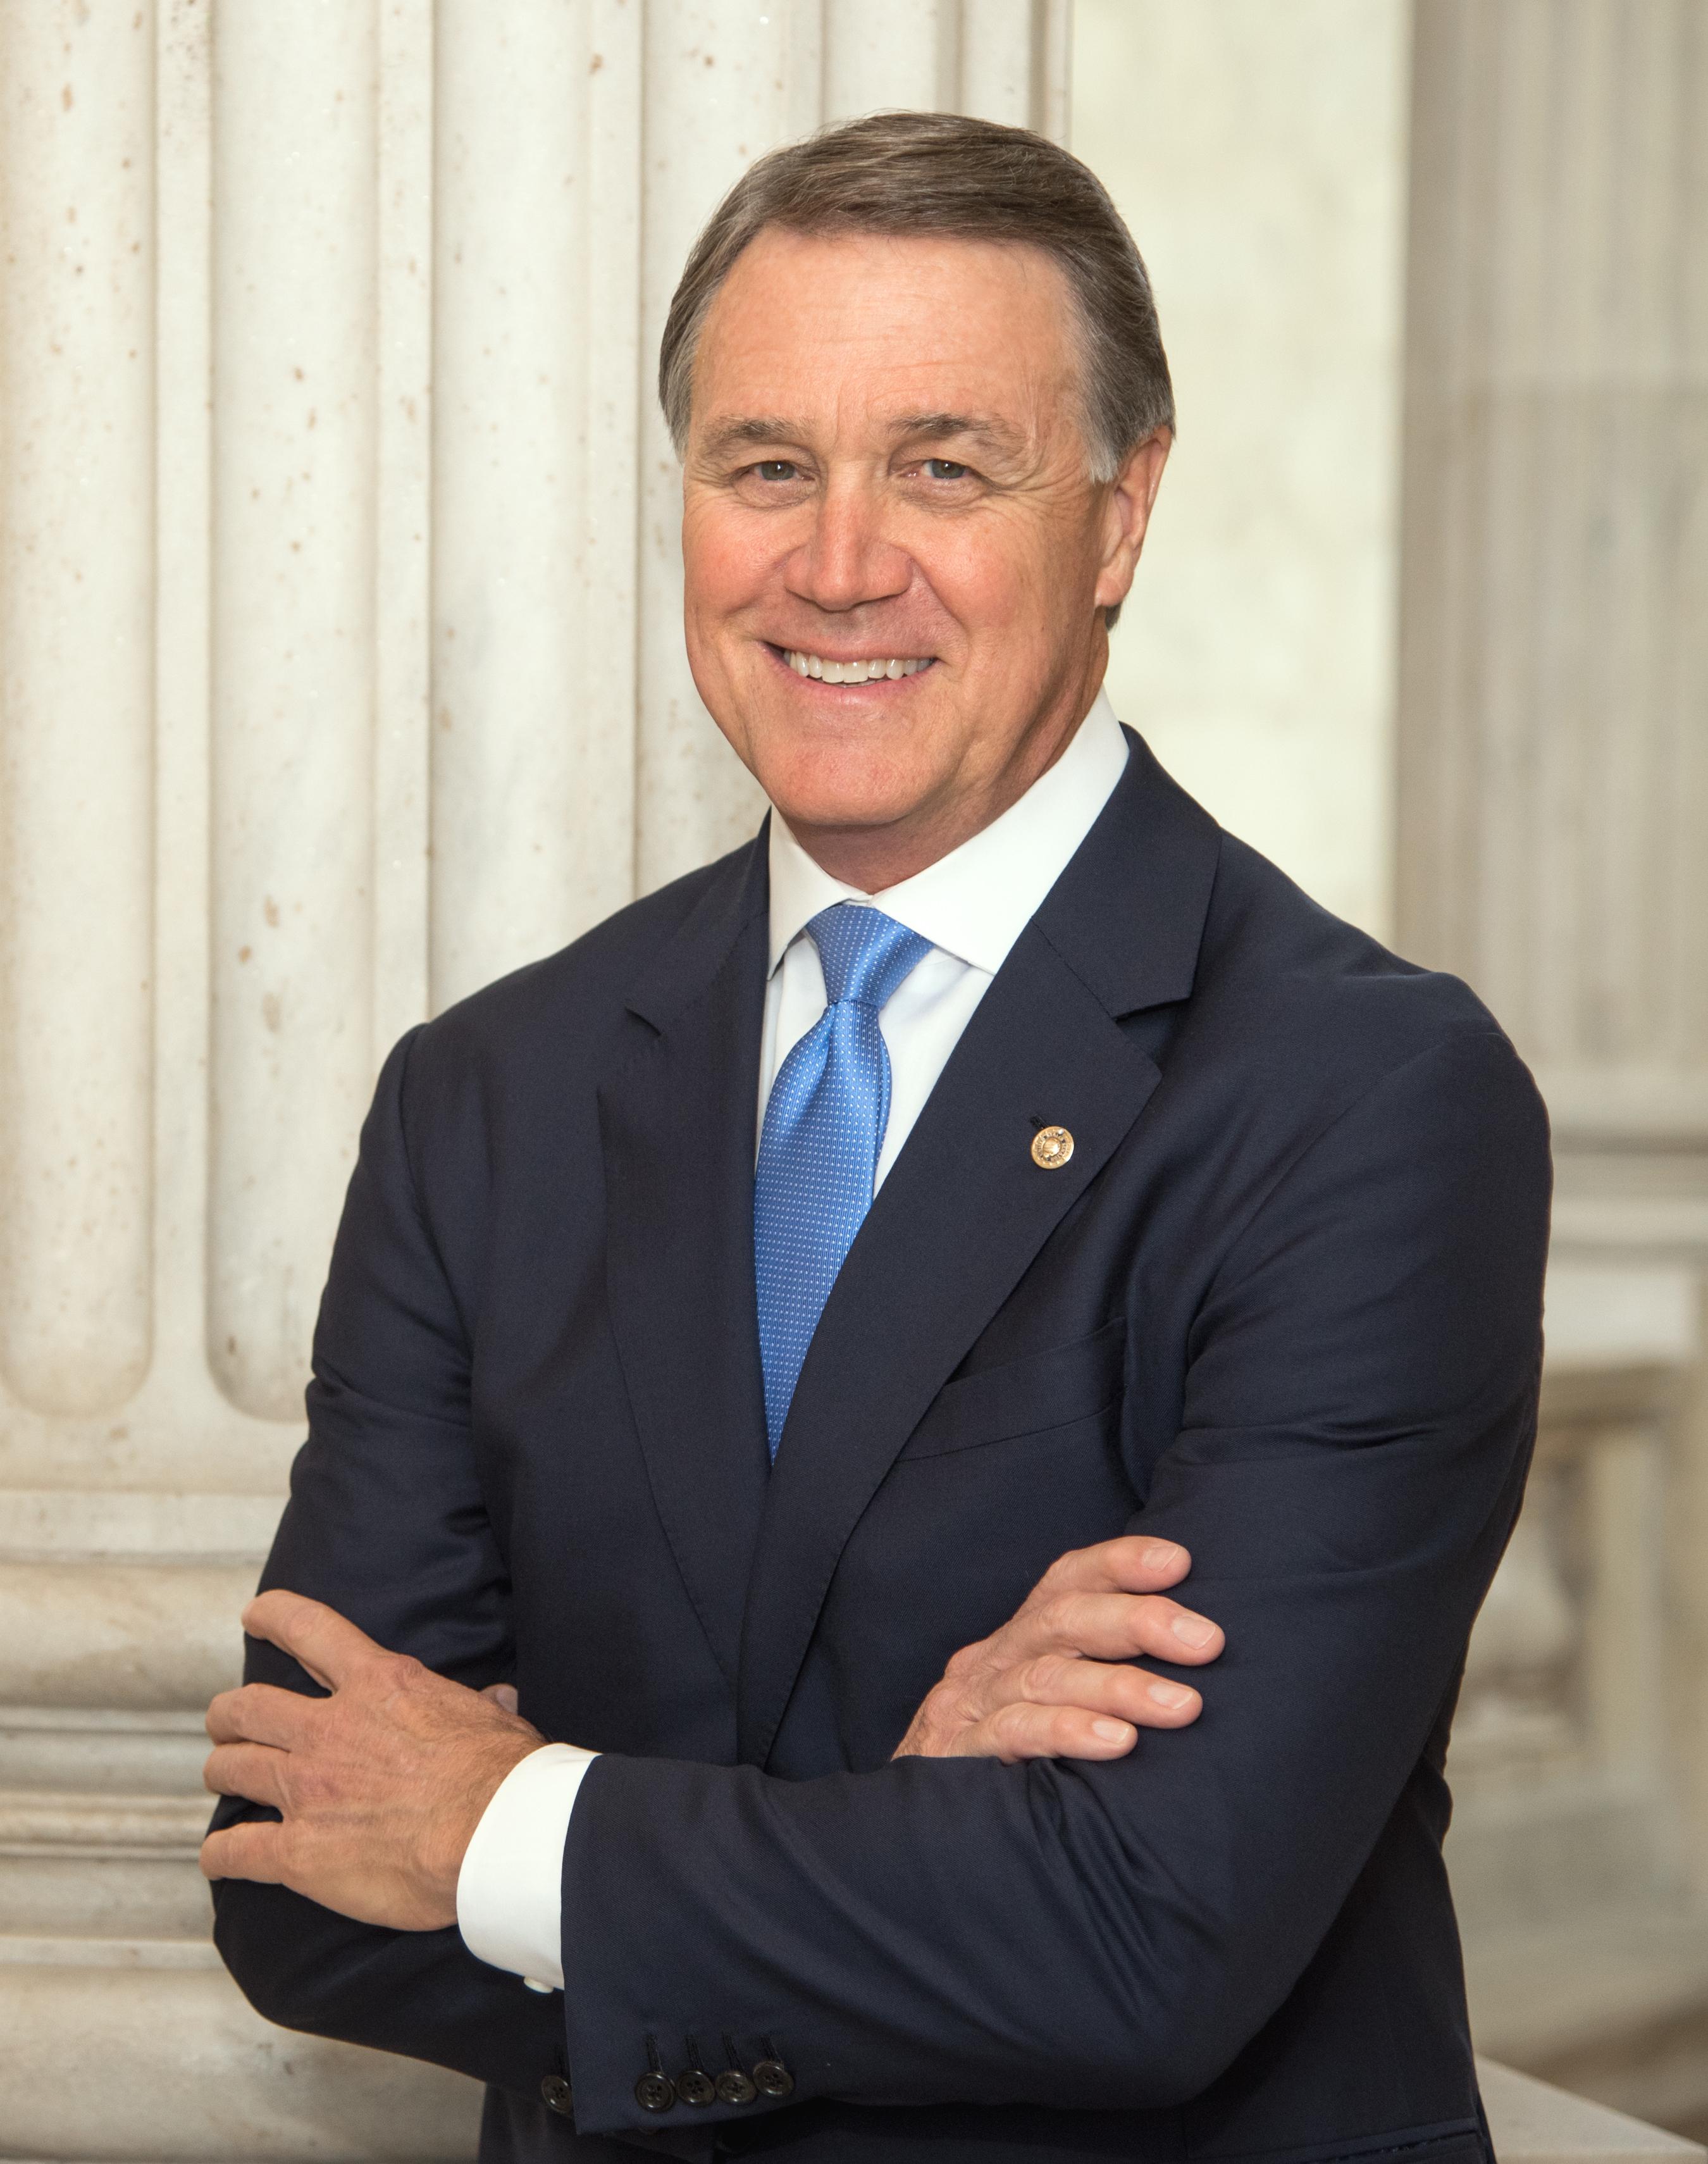 Georgia Senator David Perdue